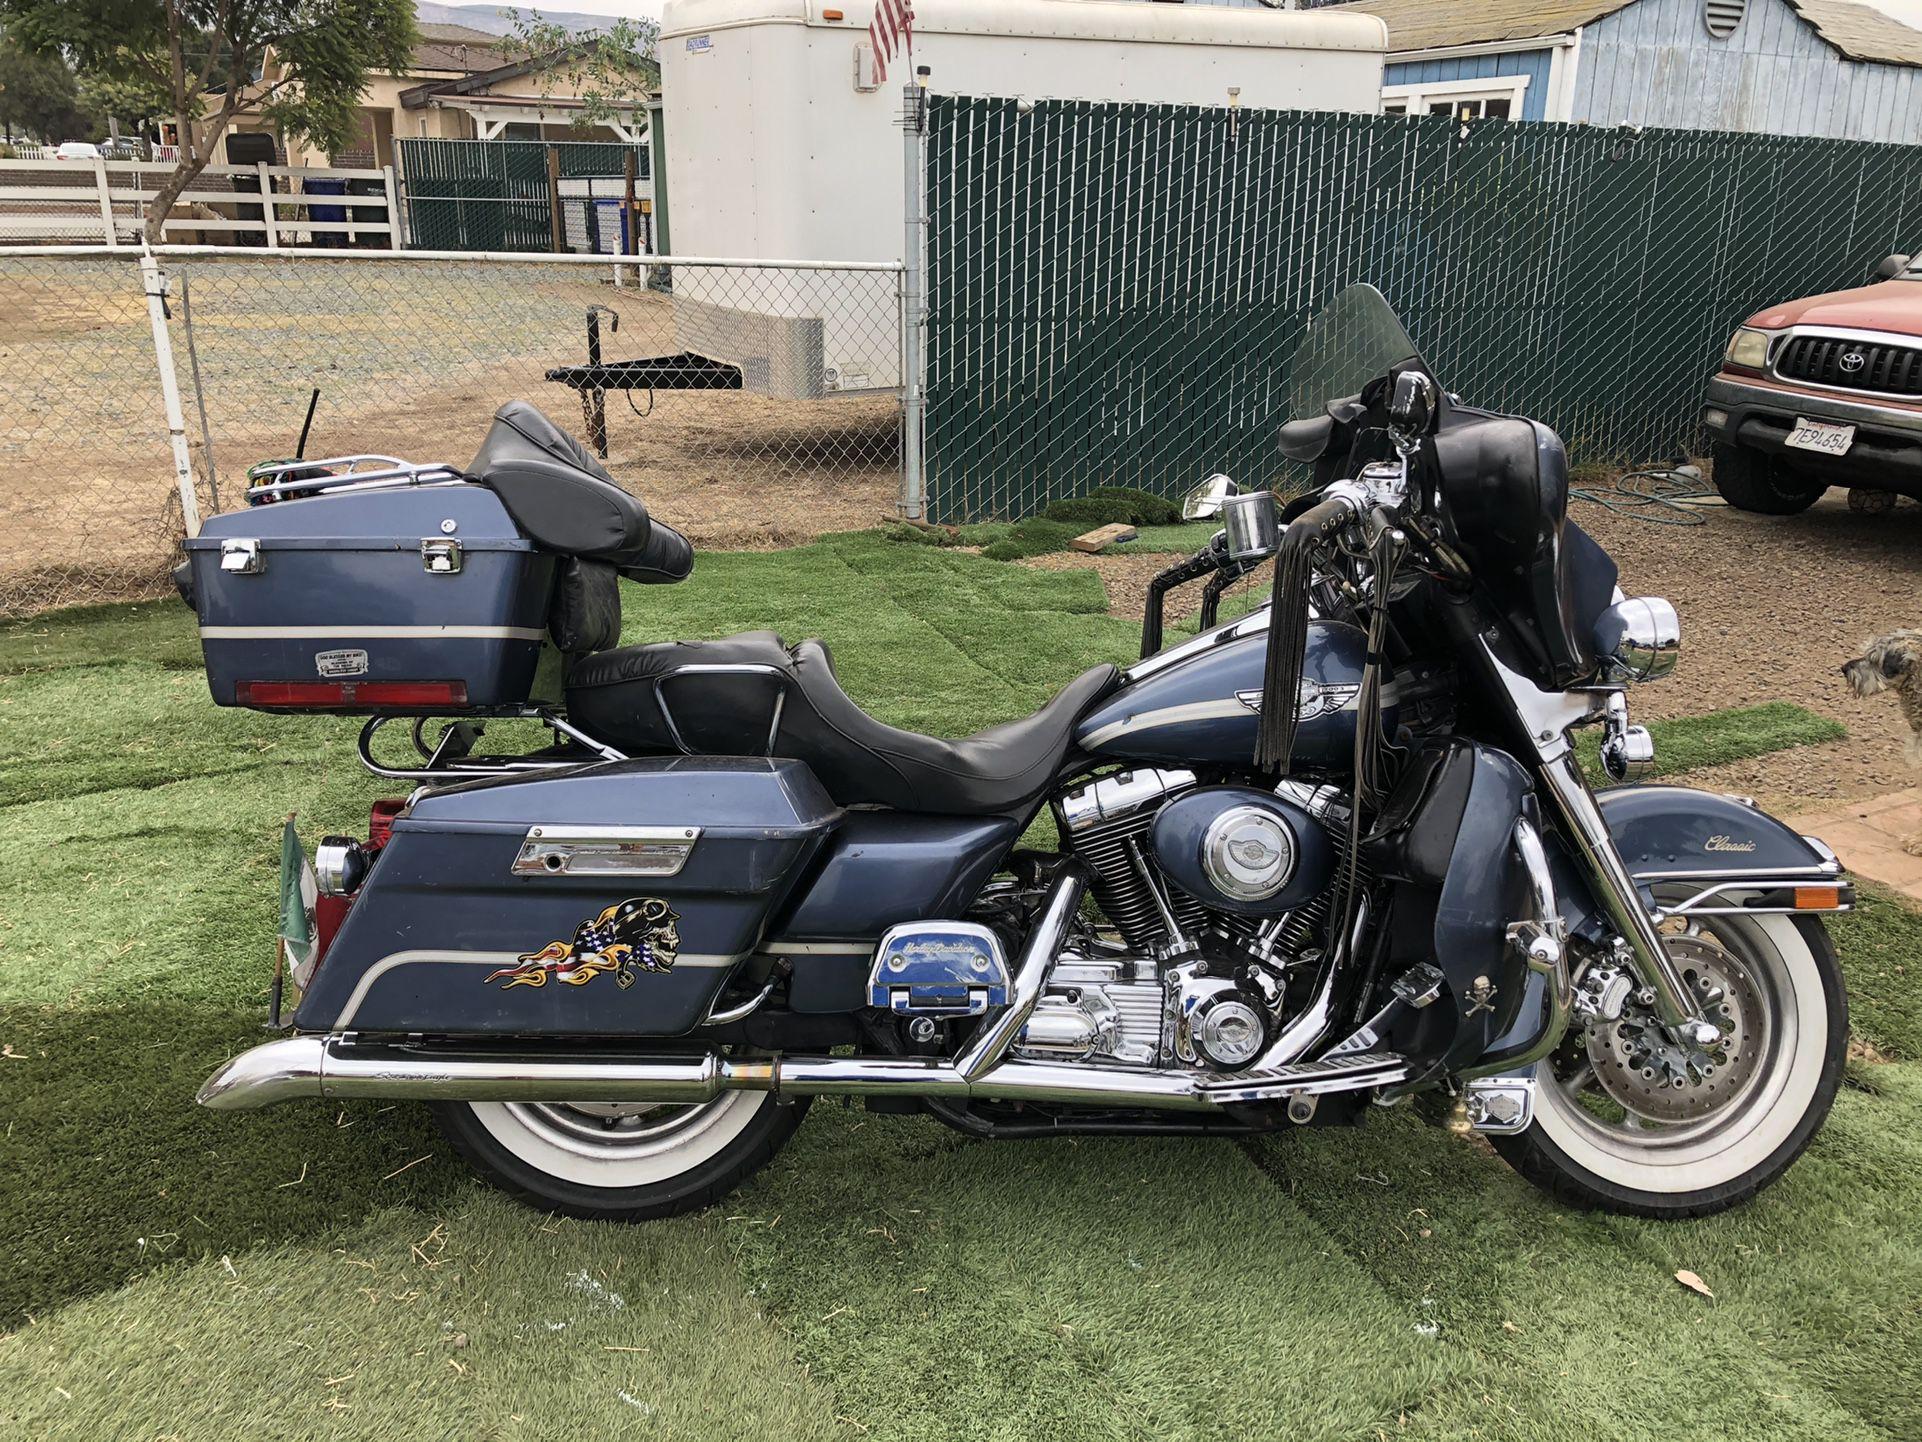 2003 Harley Davidson Electra glide